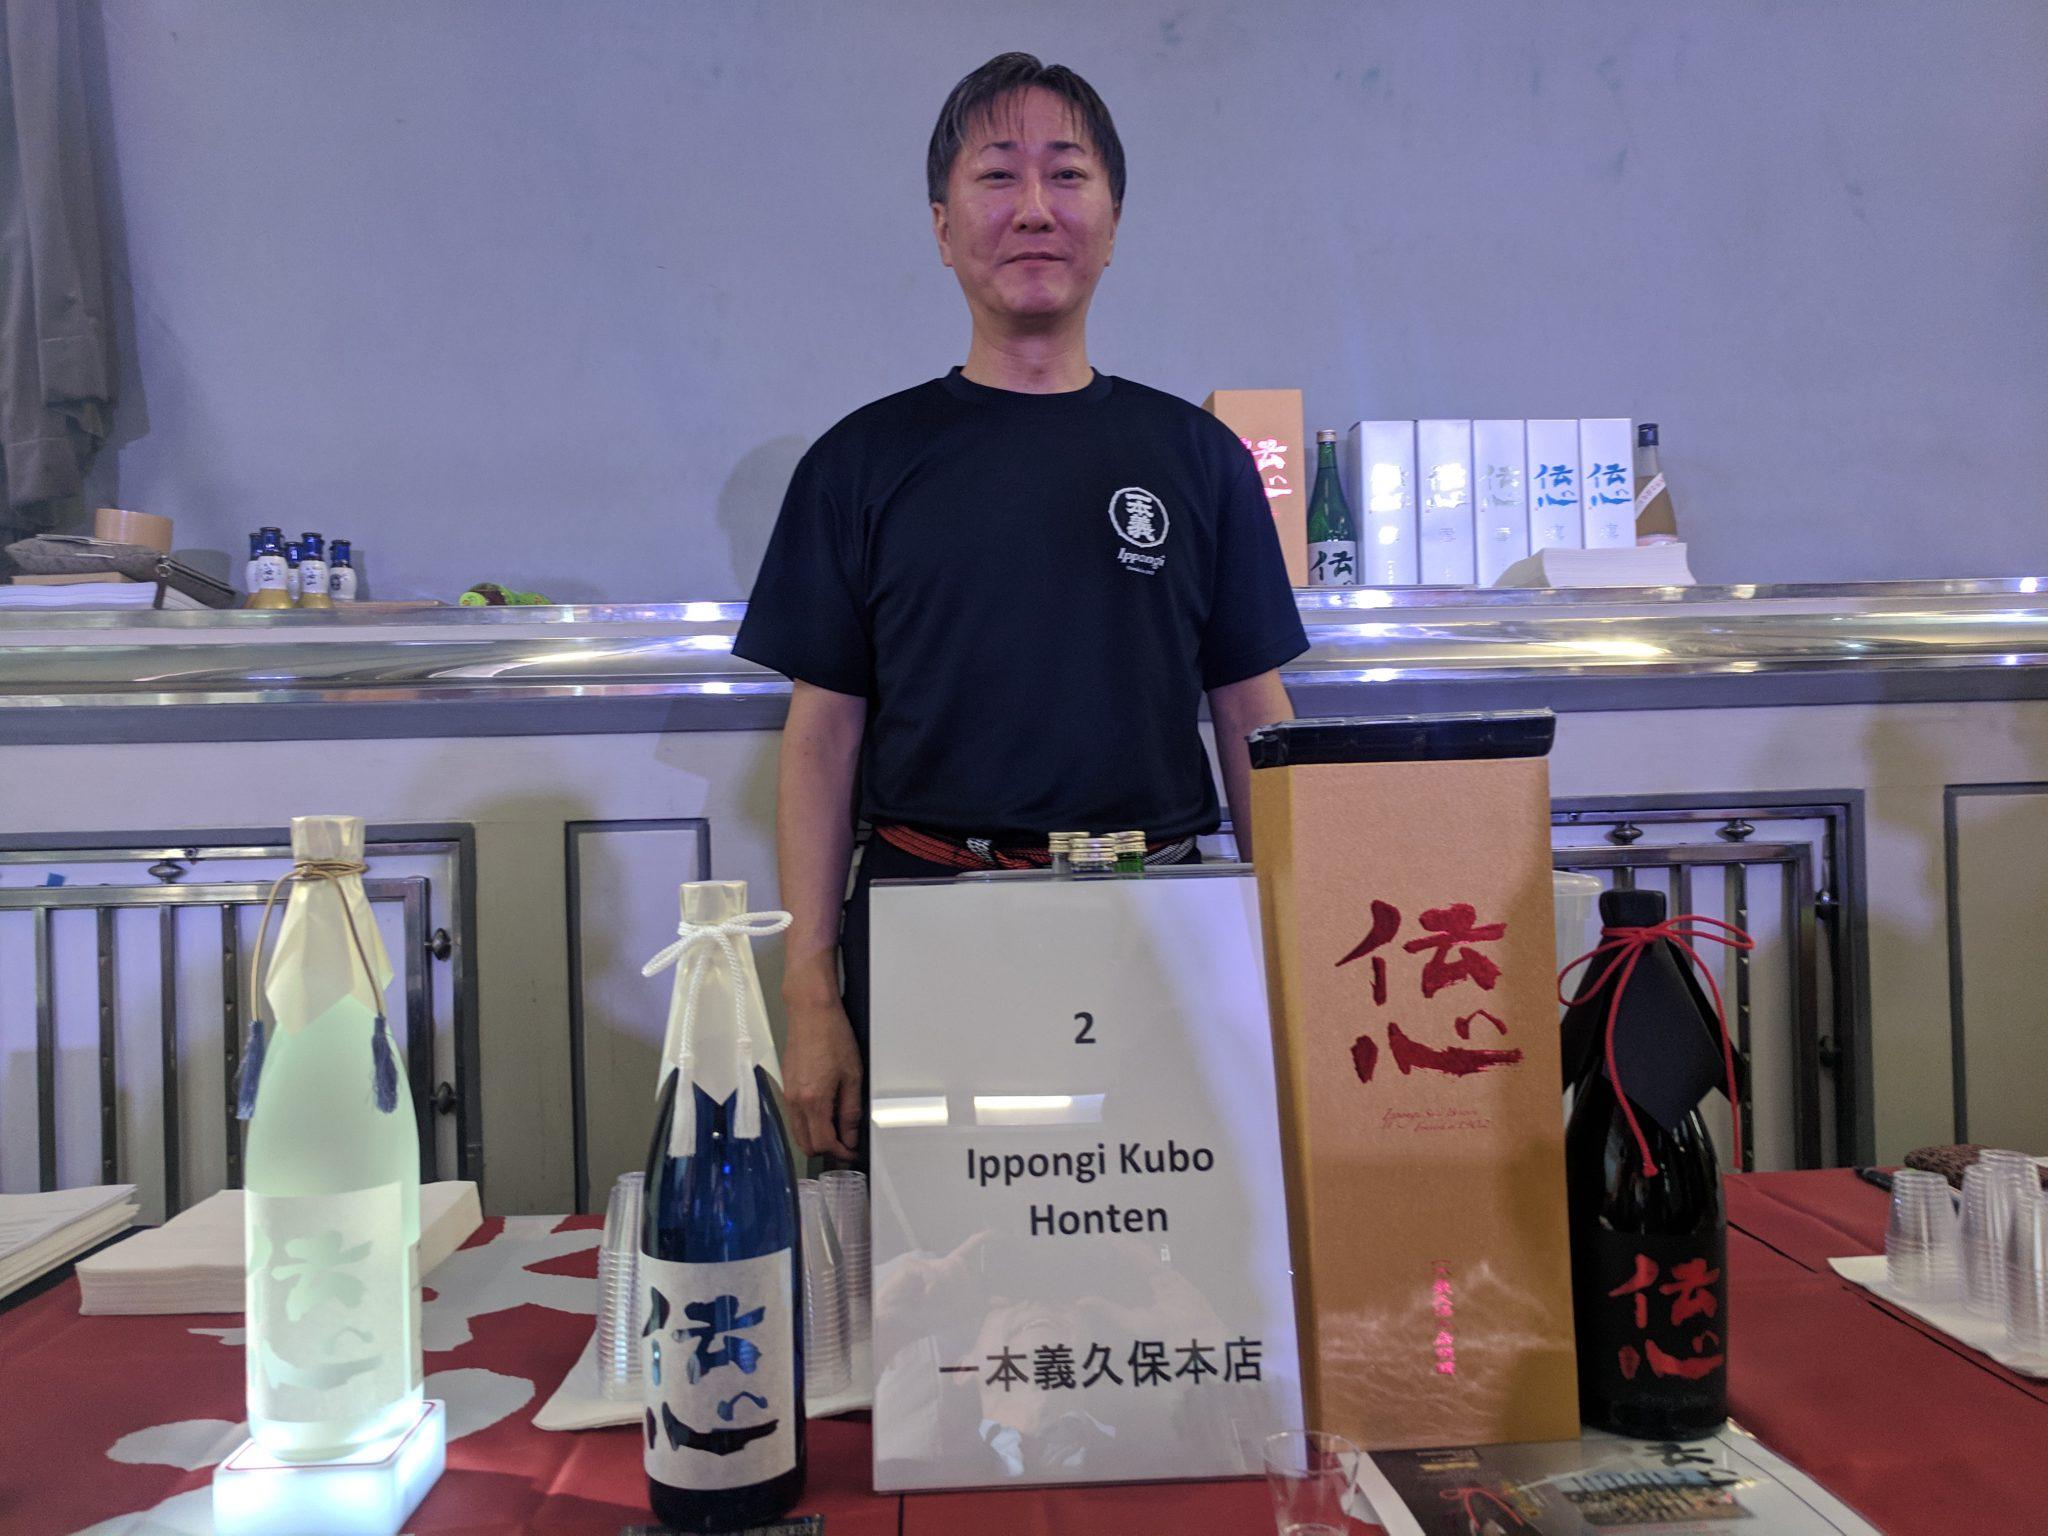 Sake Expo: Ippongi Kubo Honten